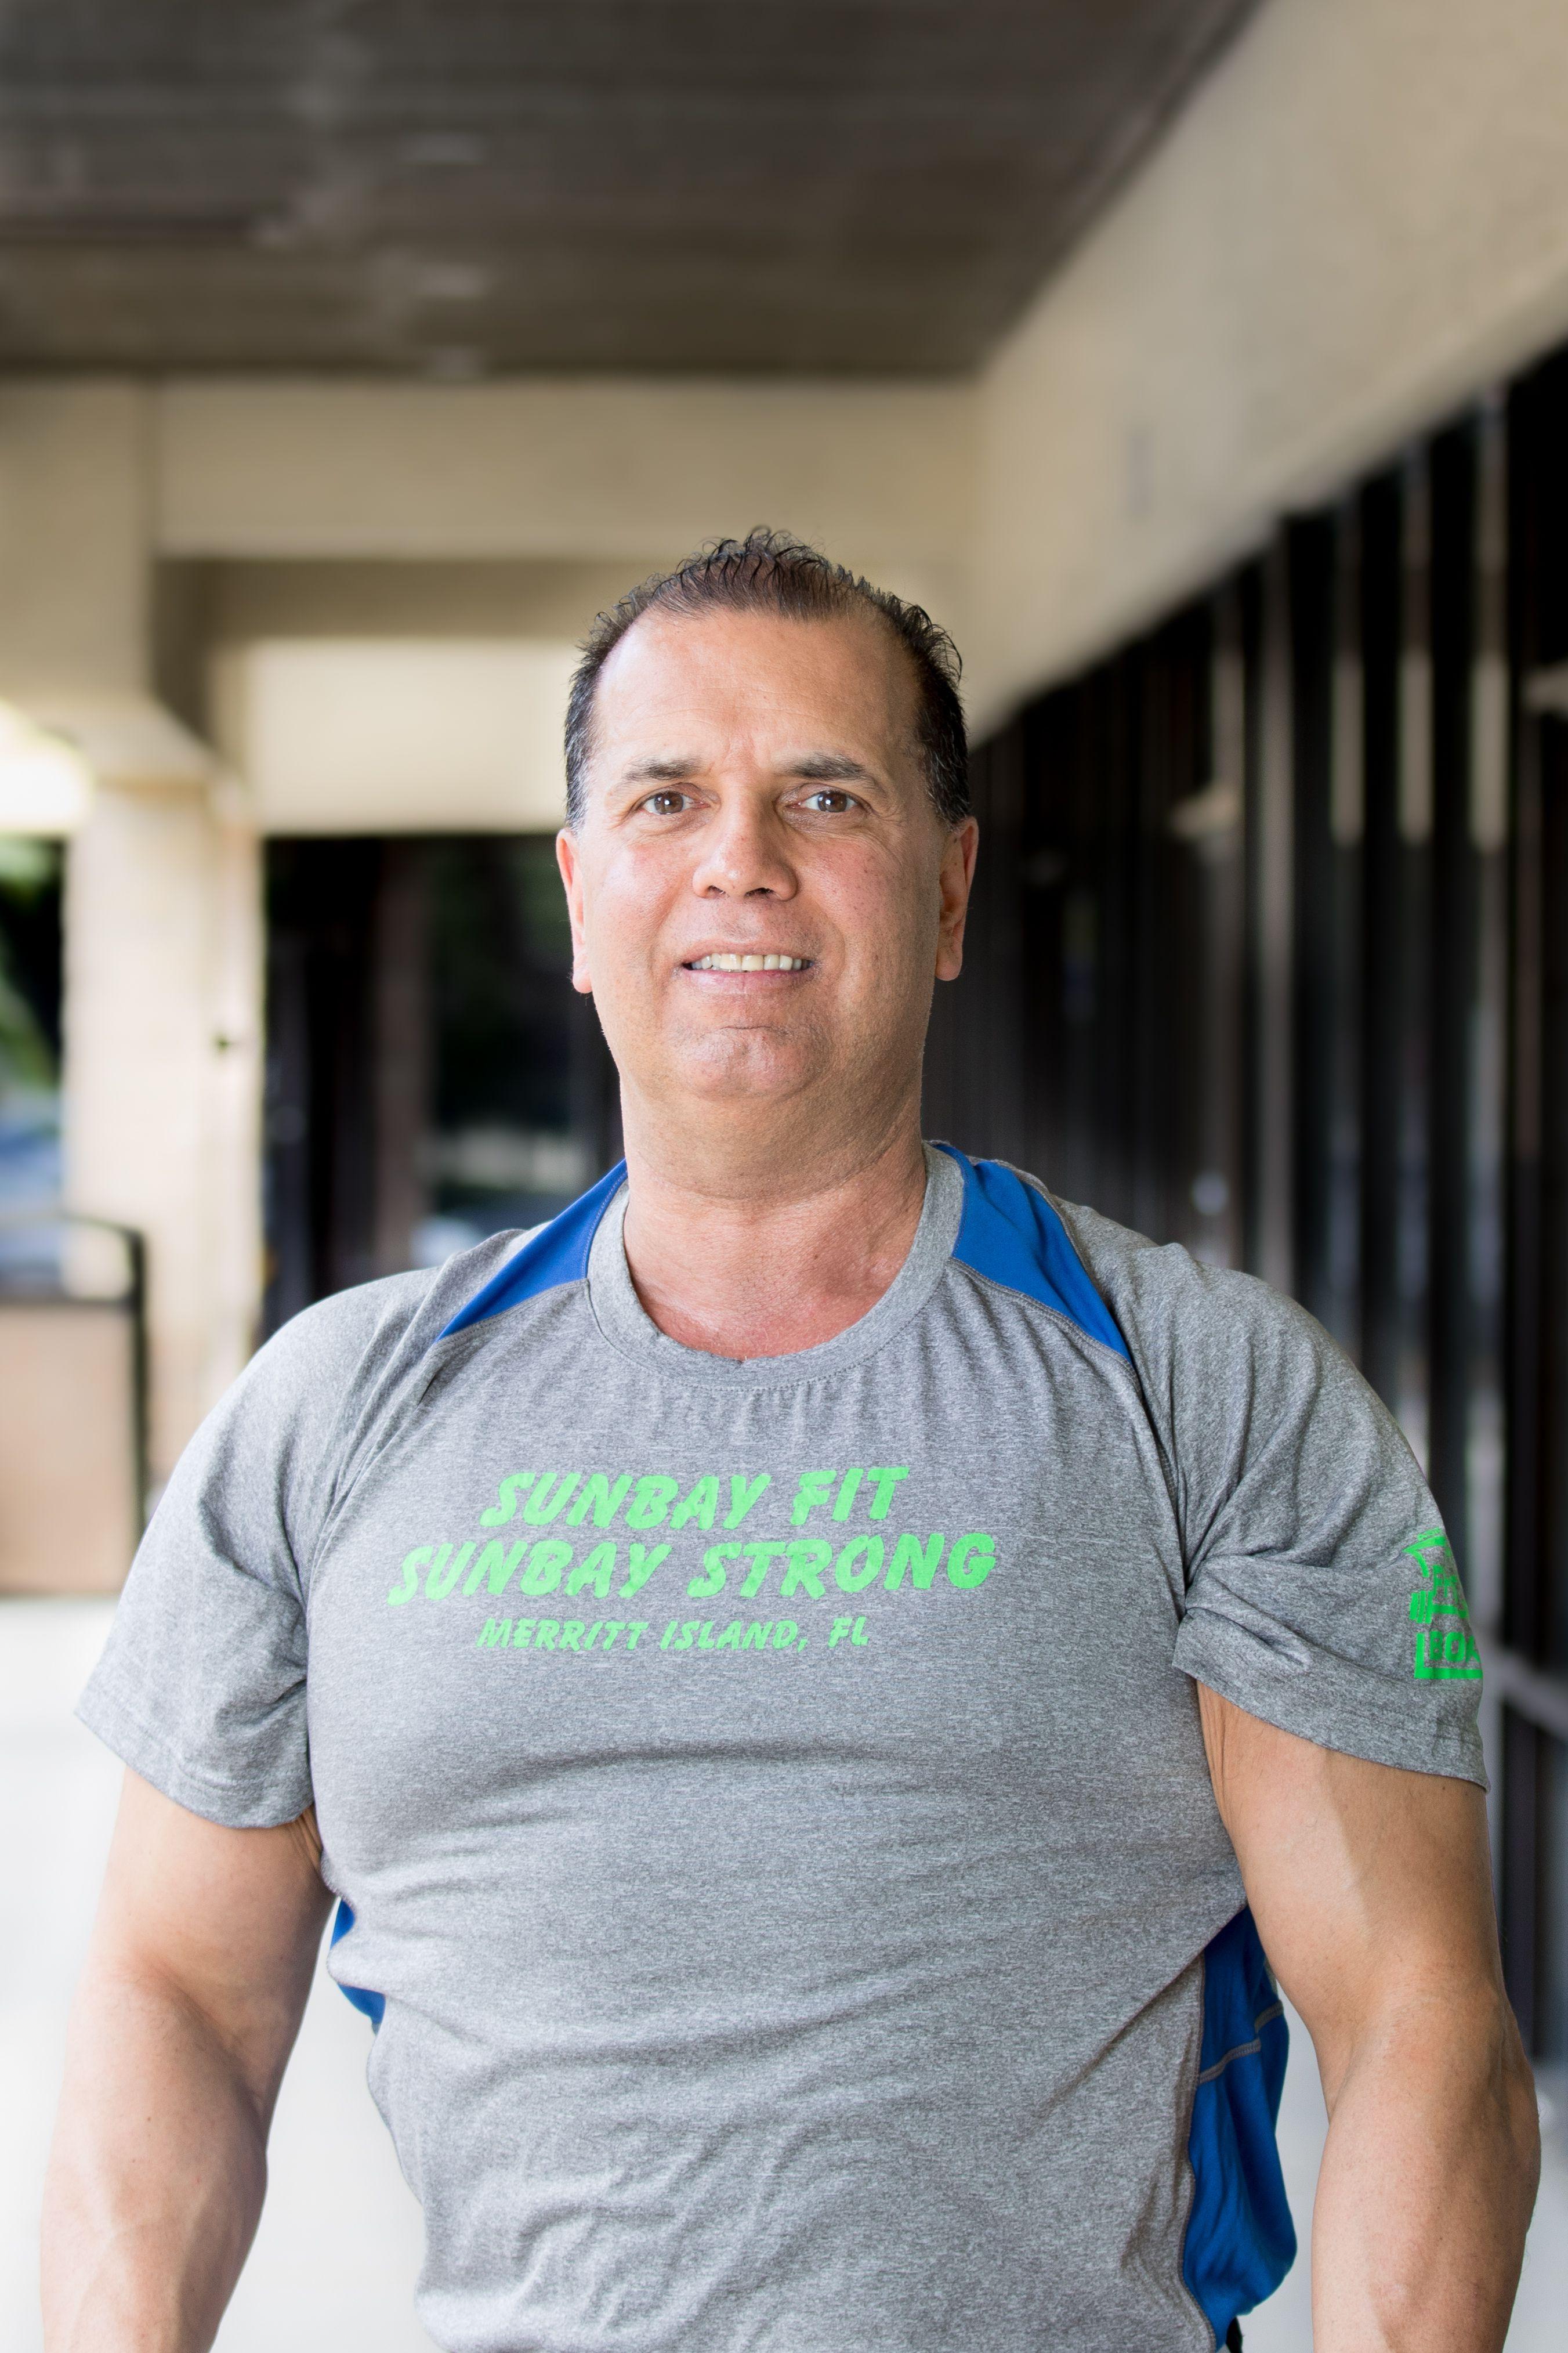 Trainers Sunbay Fitness